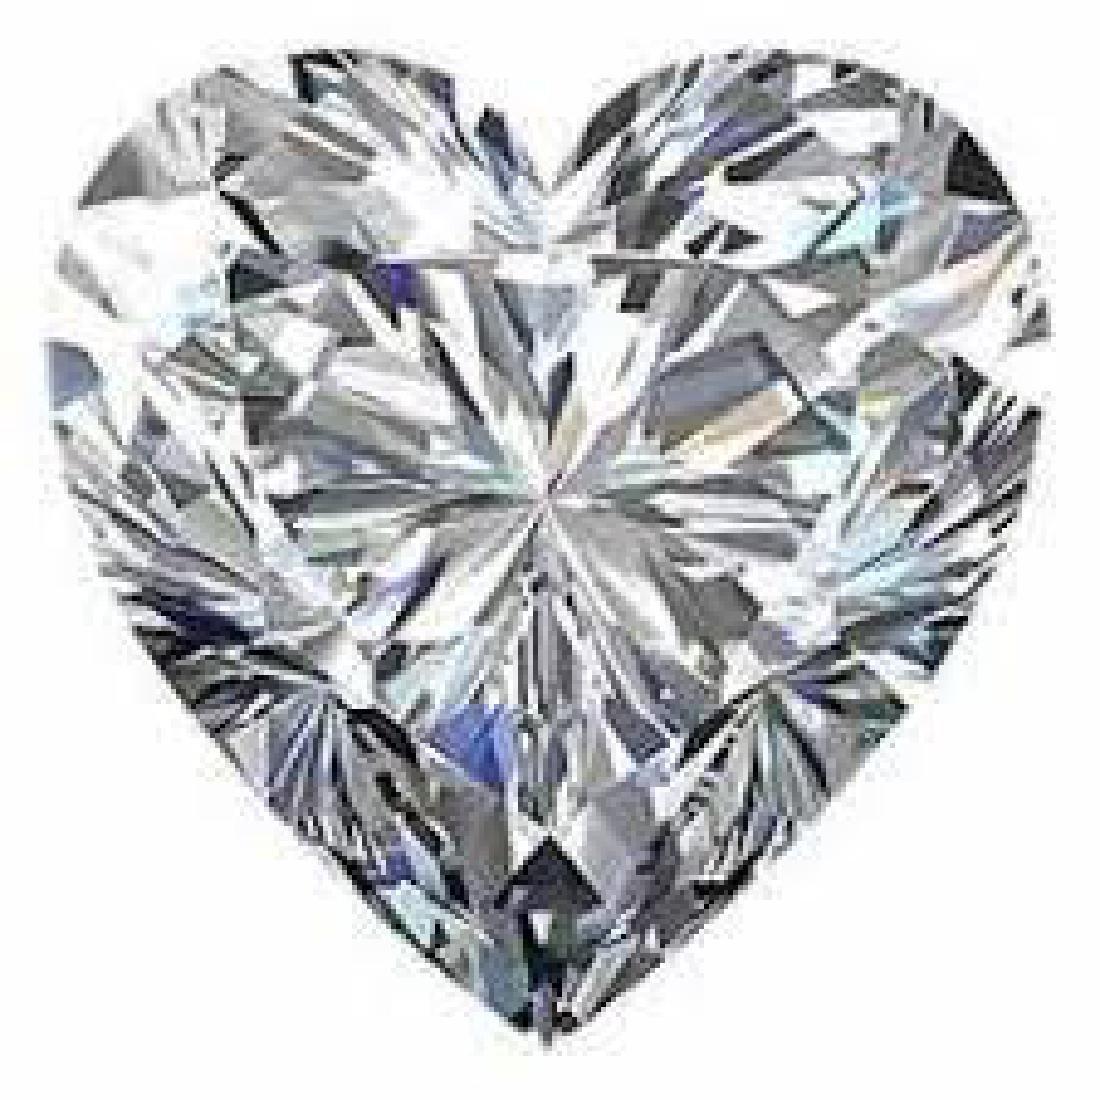 10 carat Heart Facet BIANCO Diamond